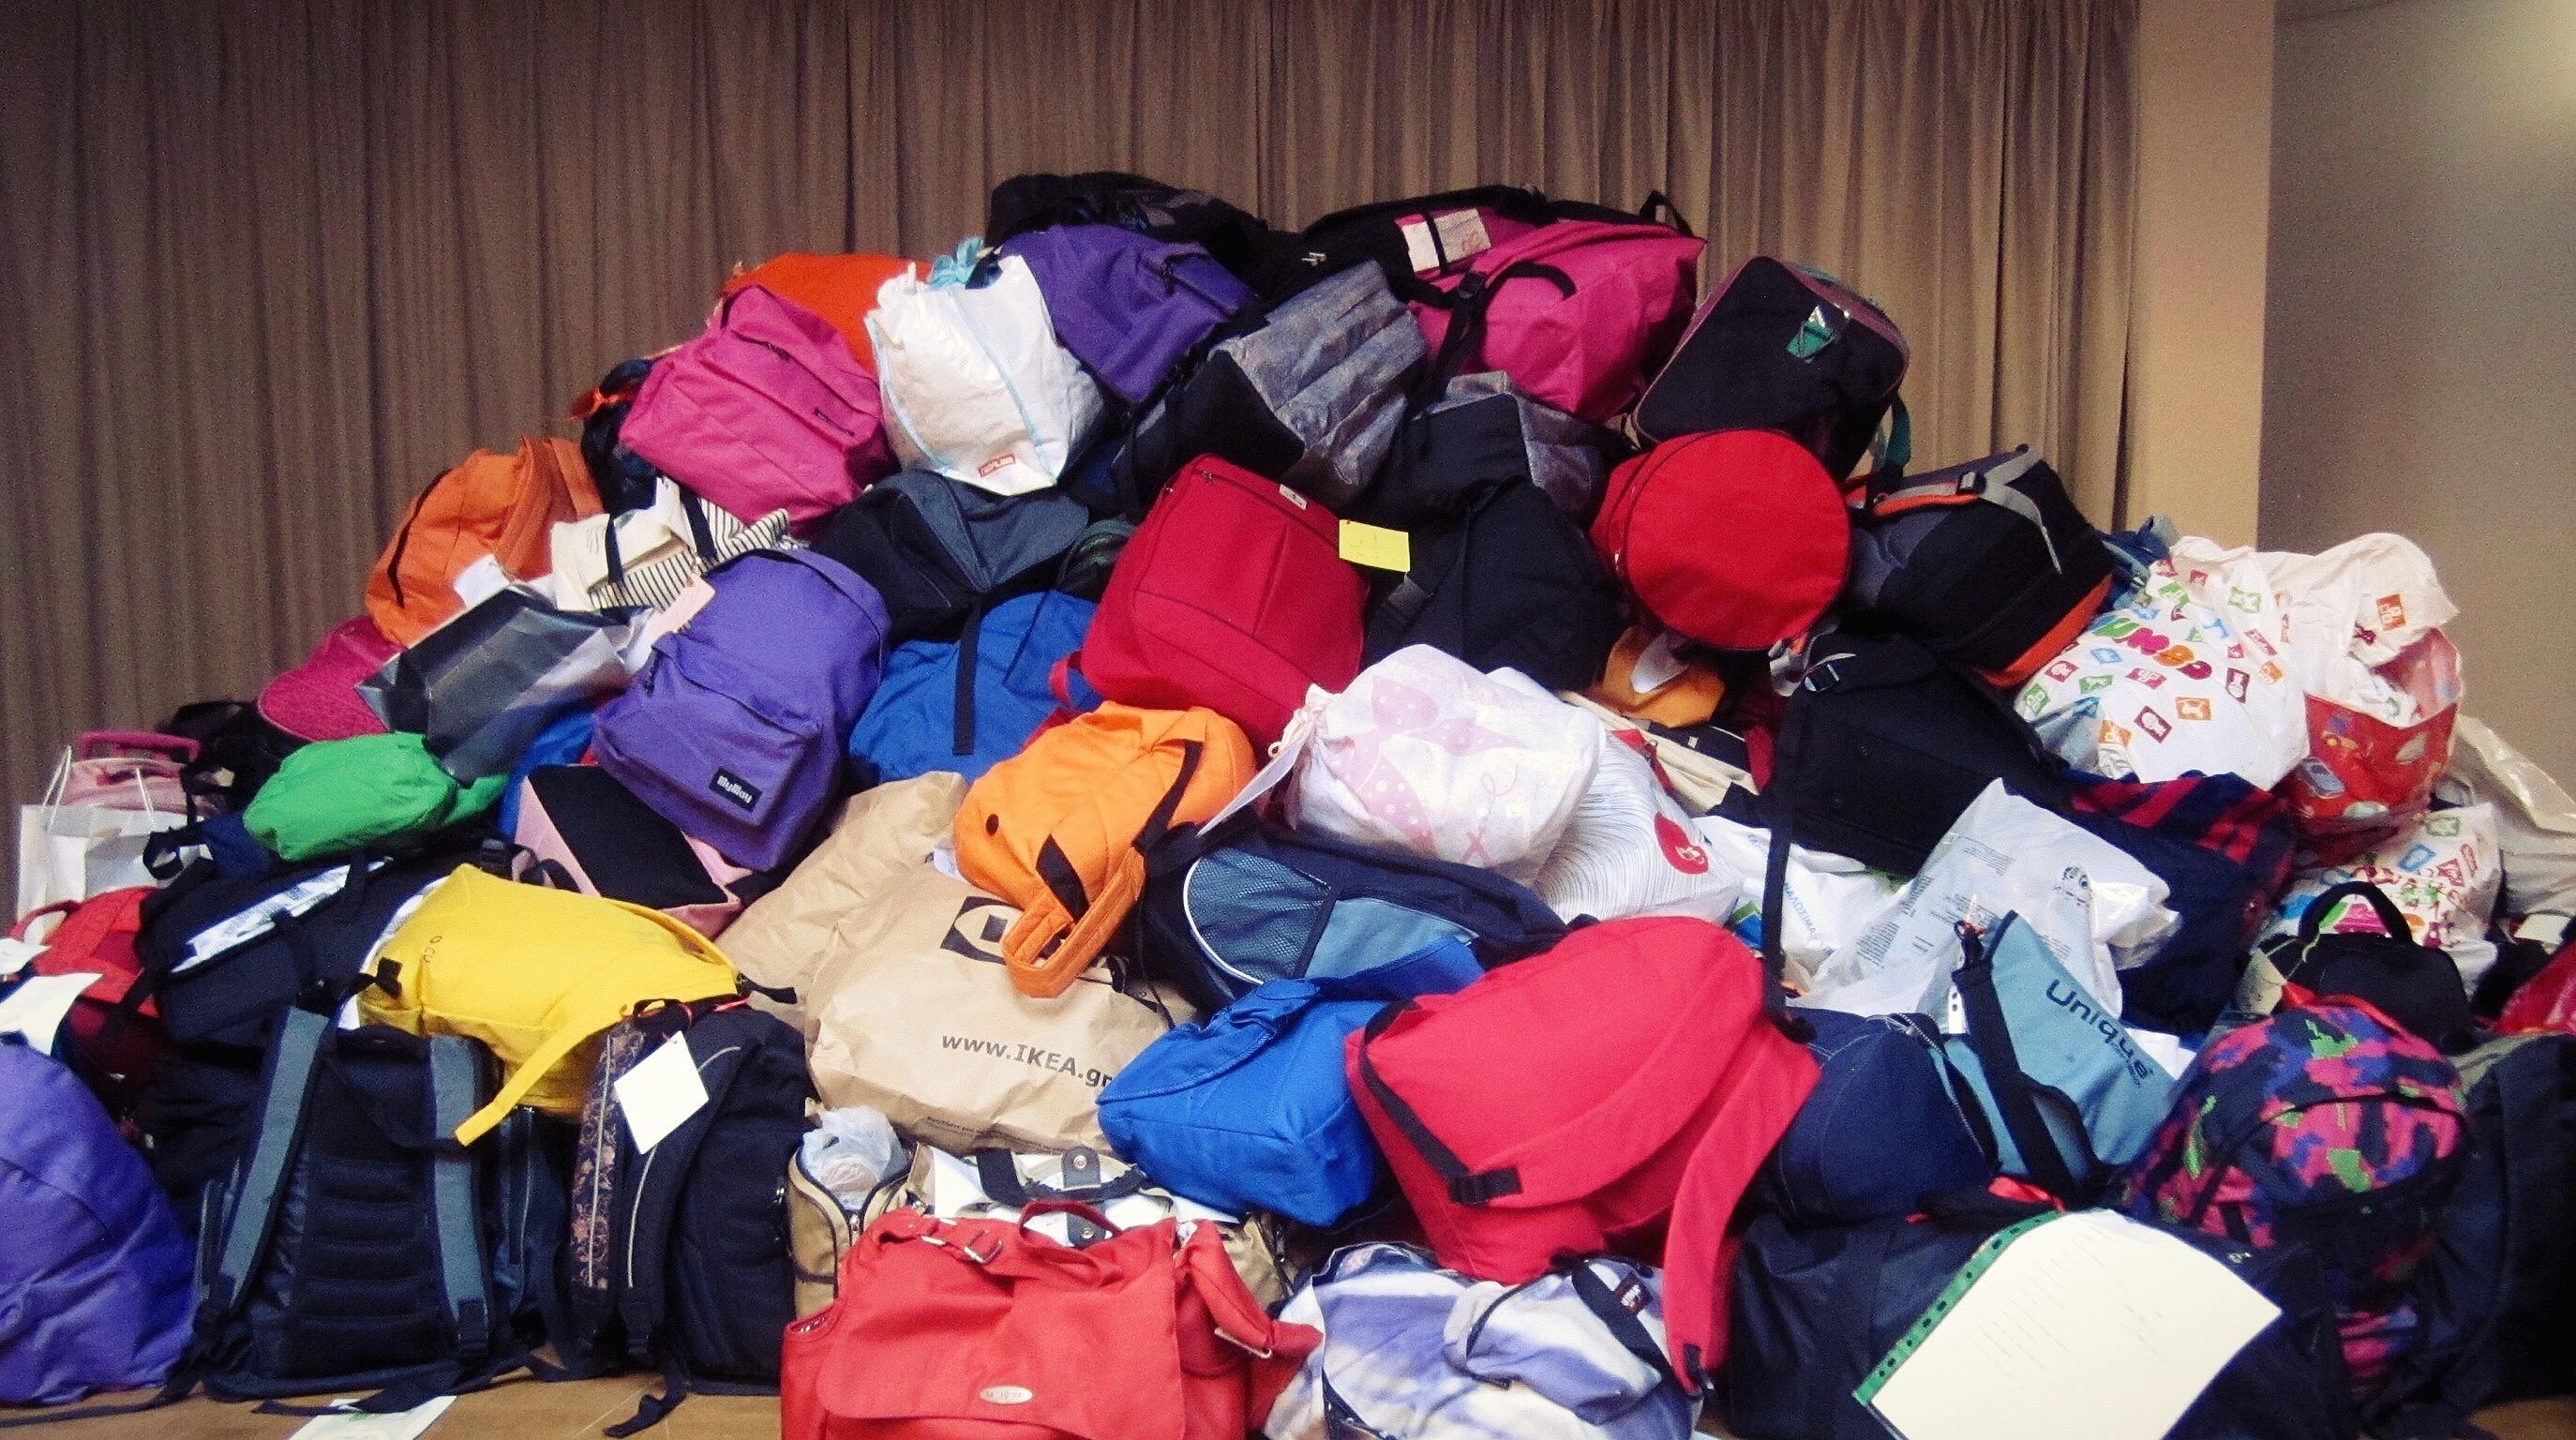 Pack-a-bag